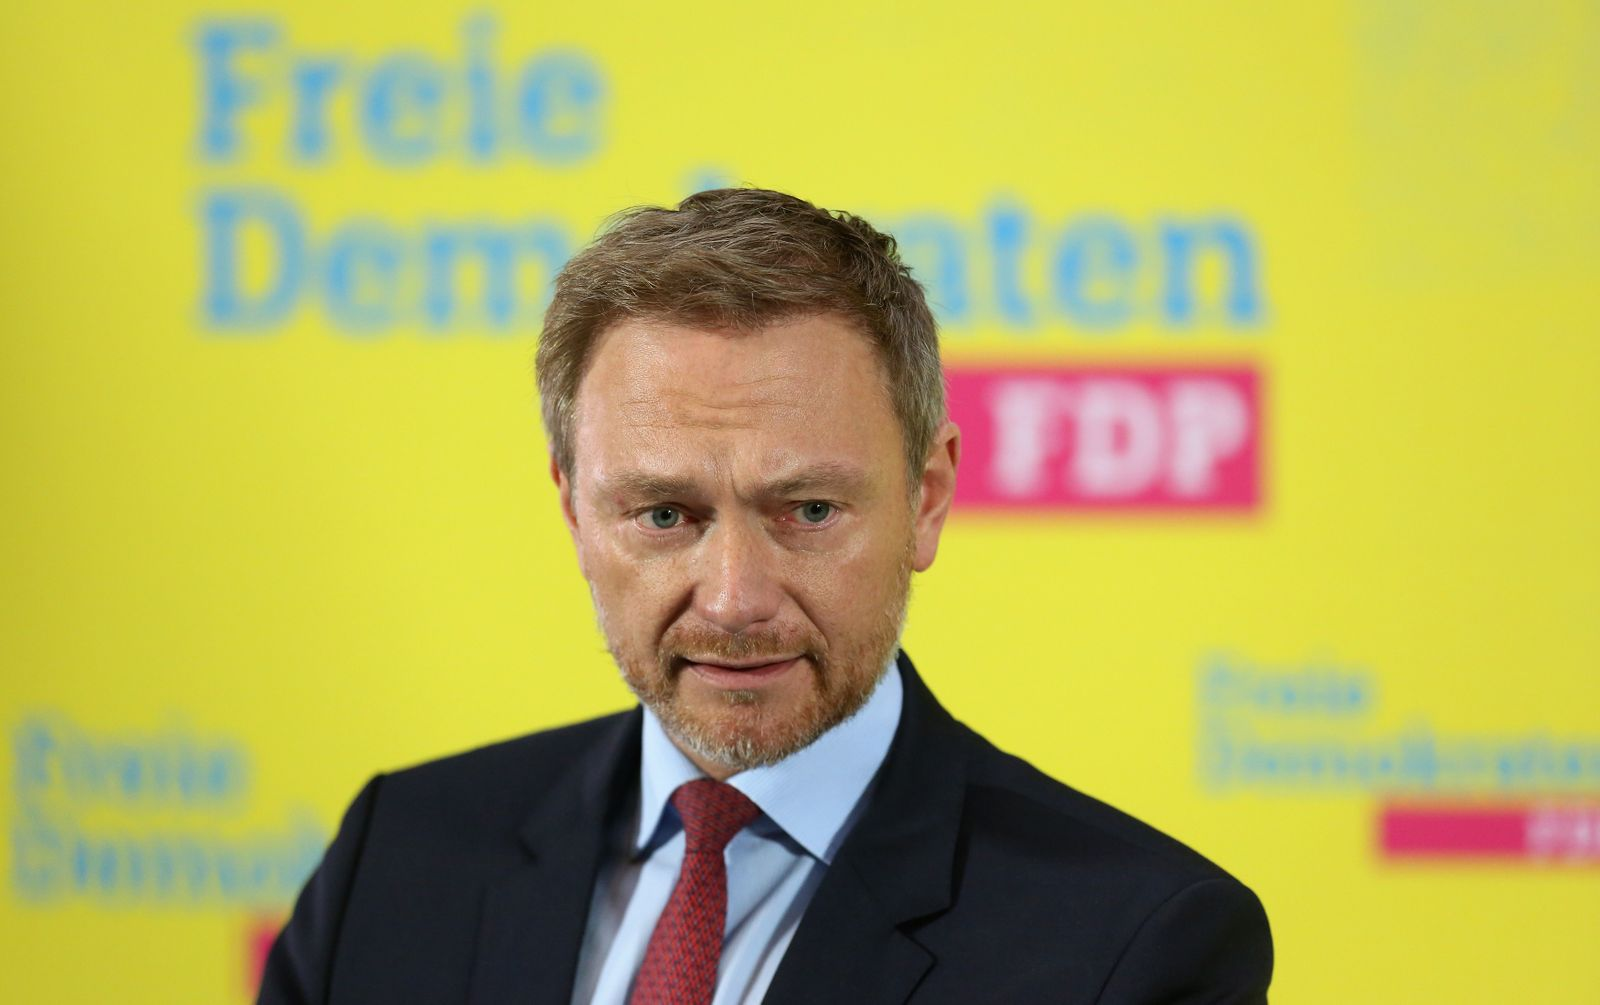 CORRECTION-GERMANY-POLITICS-PARTIES-FDP